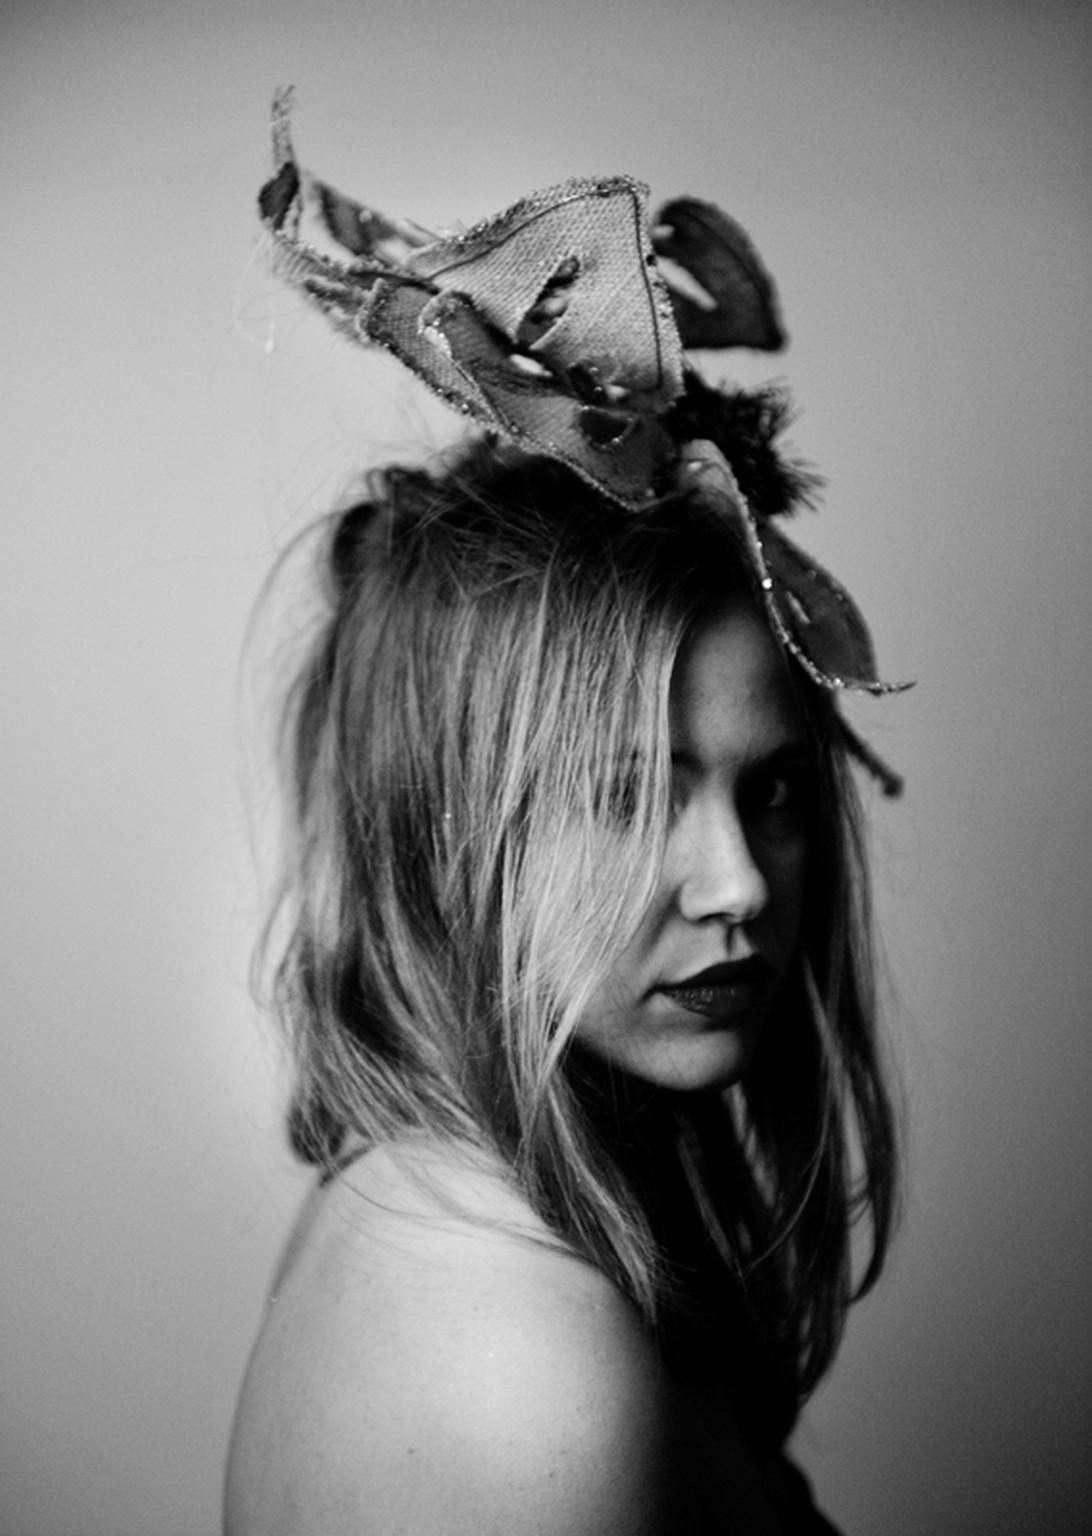 Flavia_Fiengo_portrait00005